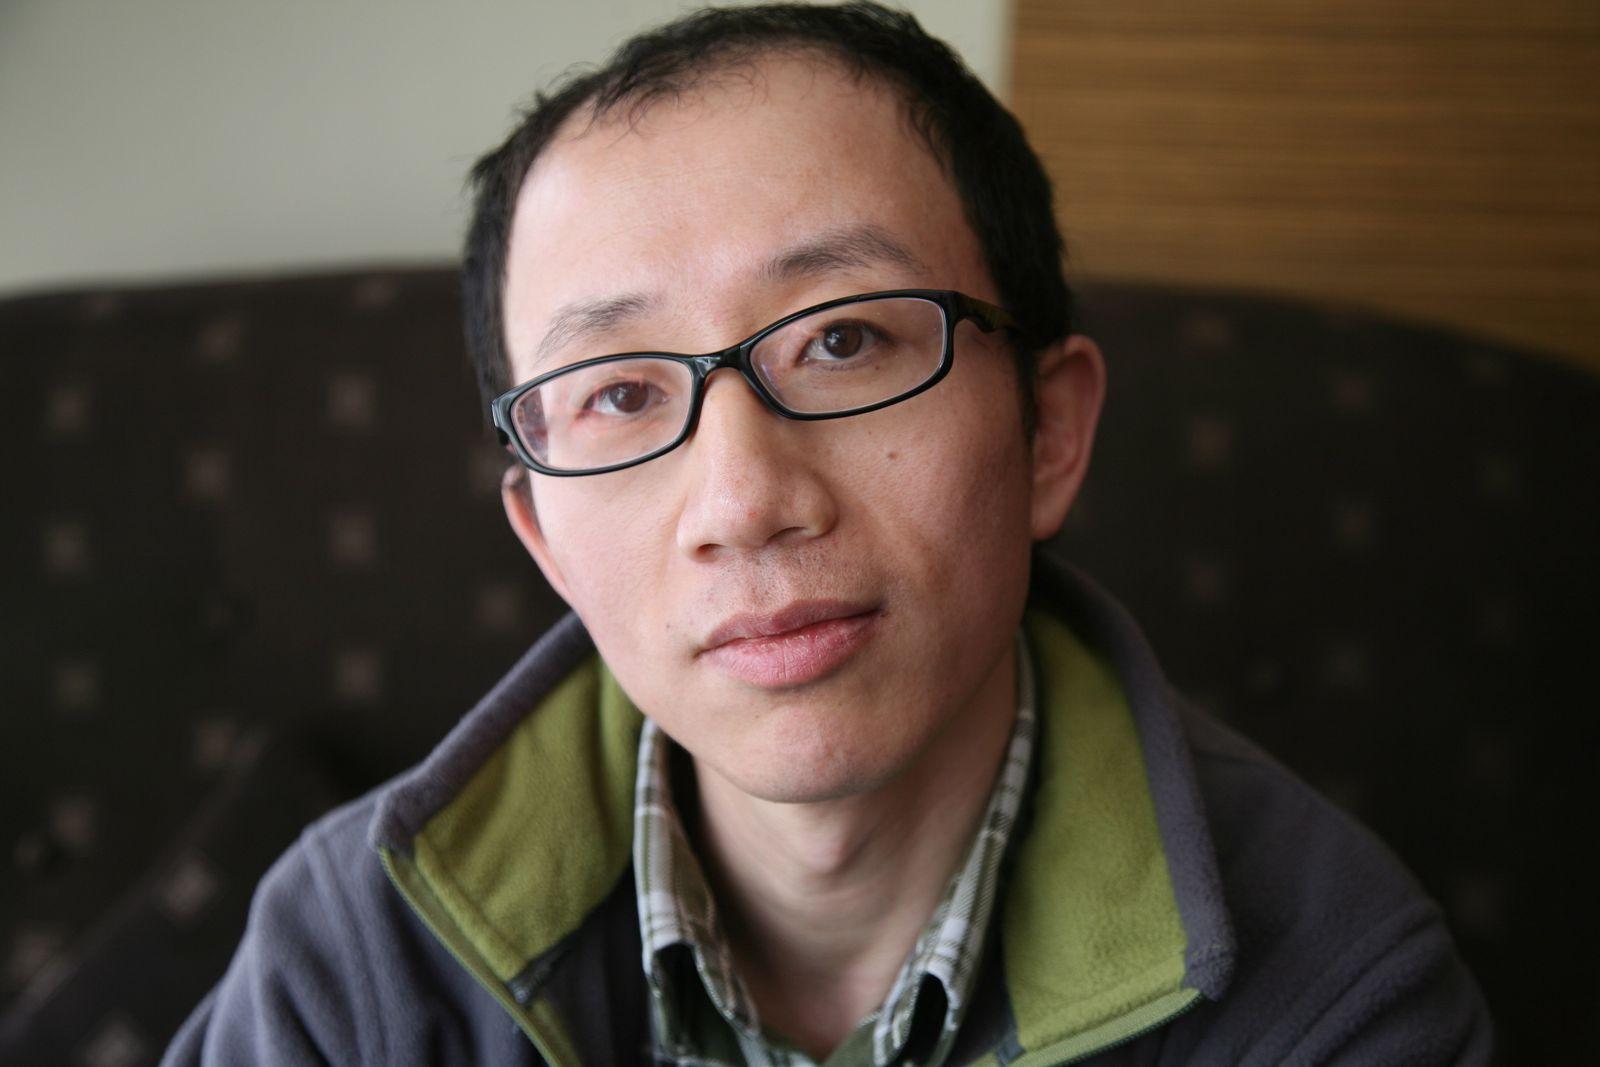 Chinese dissident Hu Jia